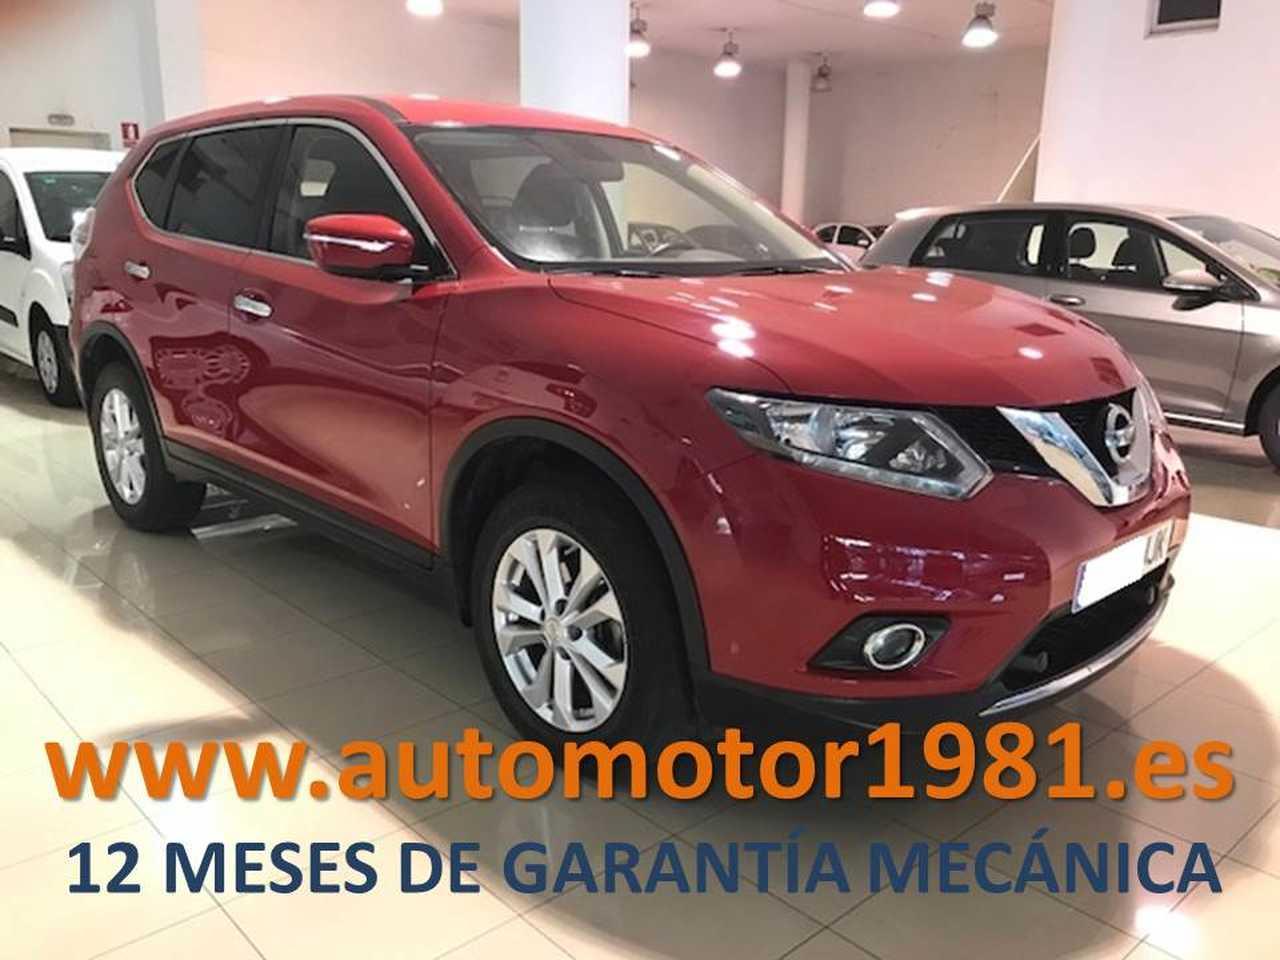 Nissan X-Trail 1.6 dCi Acenta 4x4-i - GARANTIA MECANICA  - Foto 1